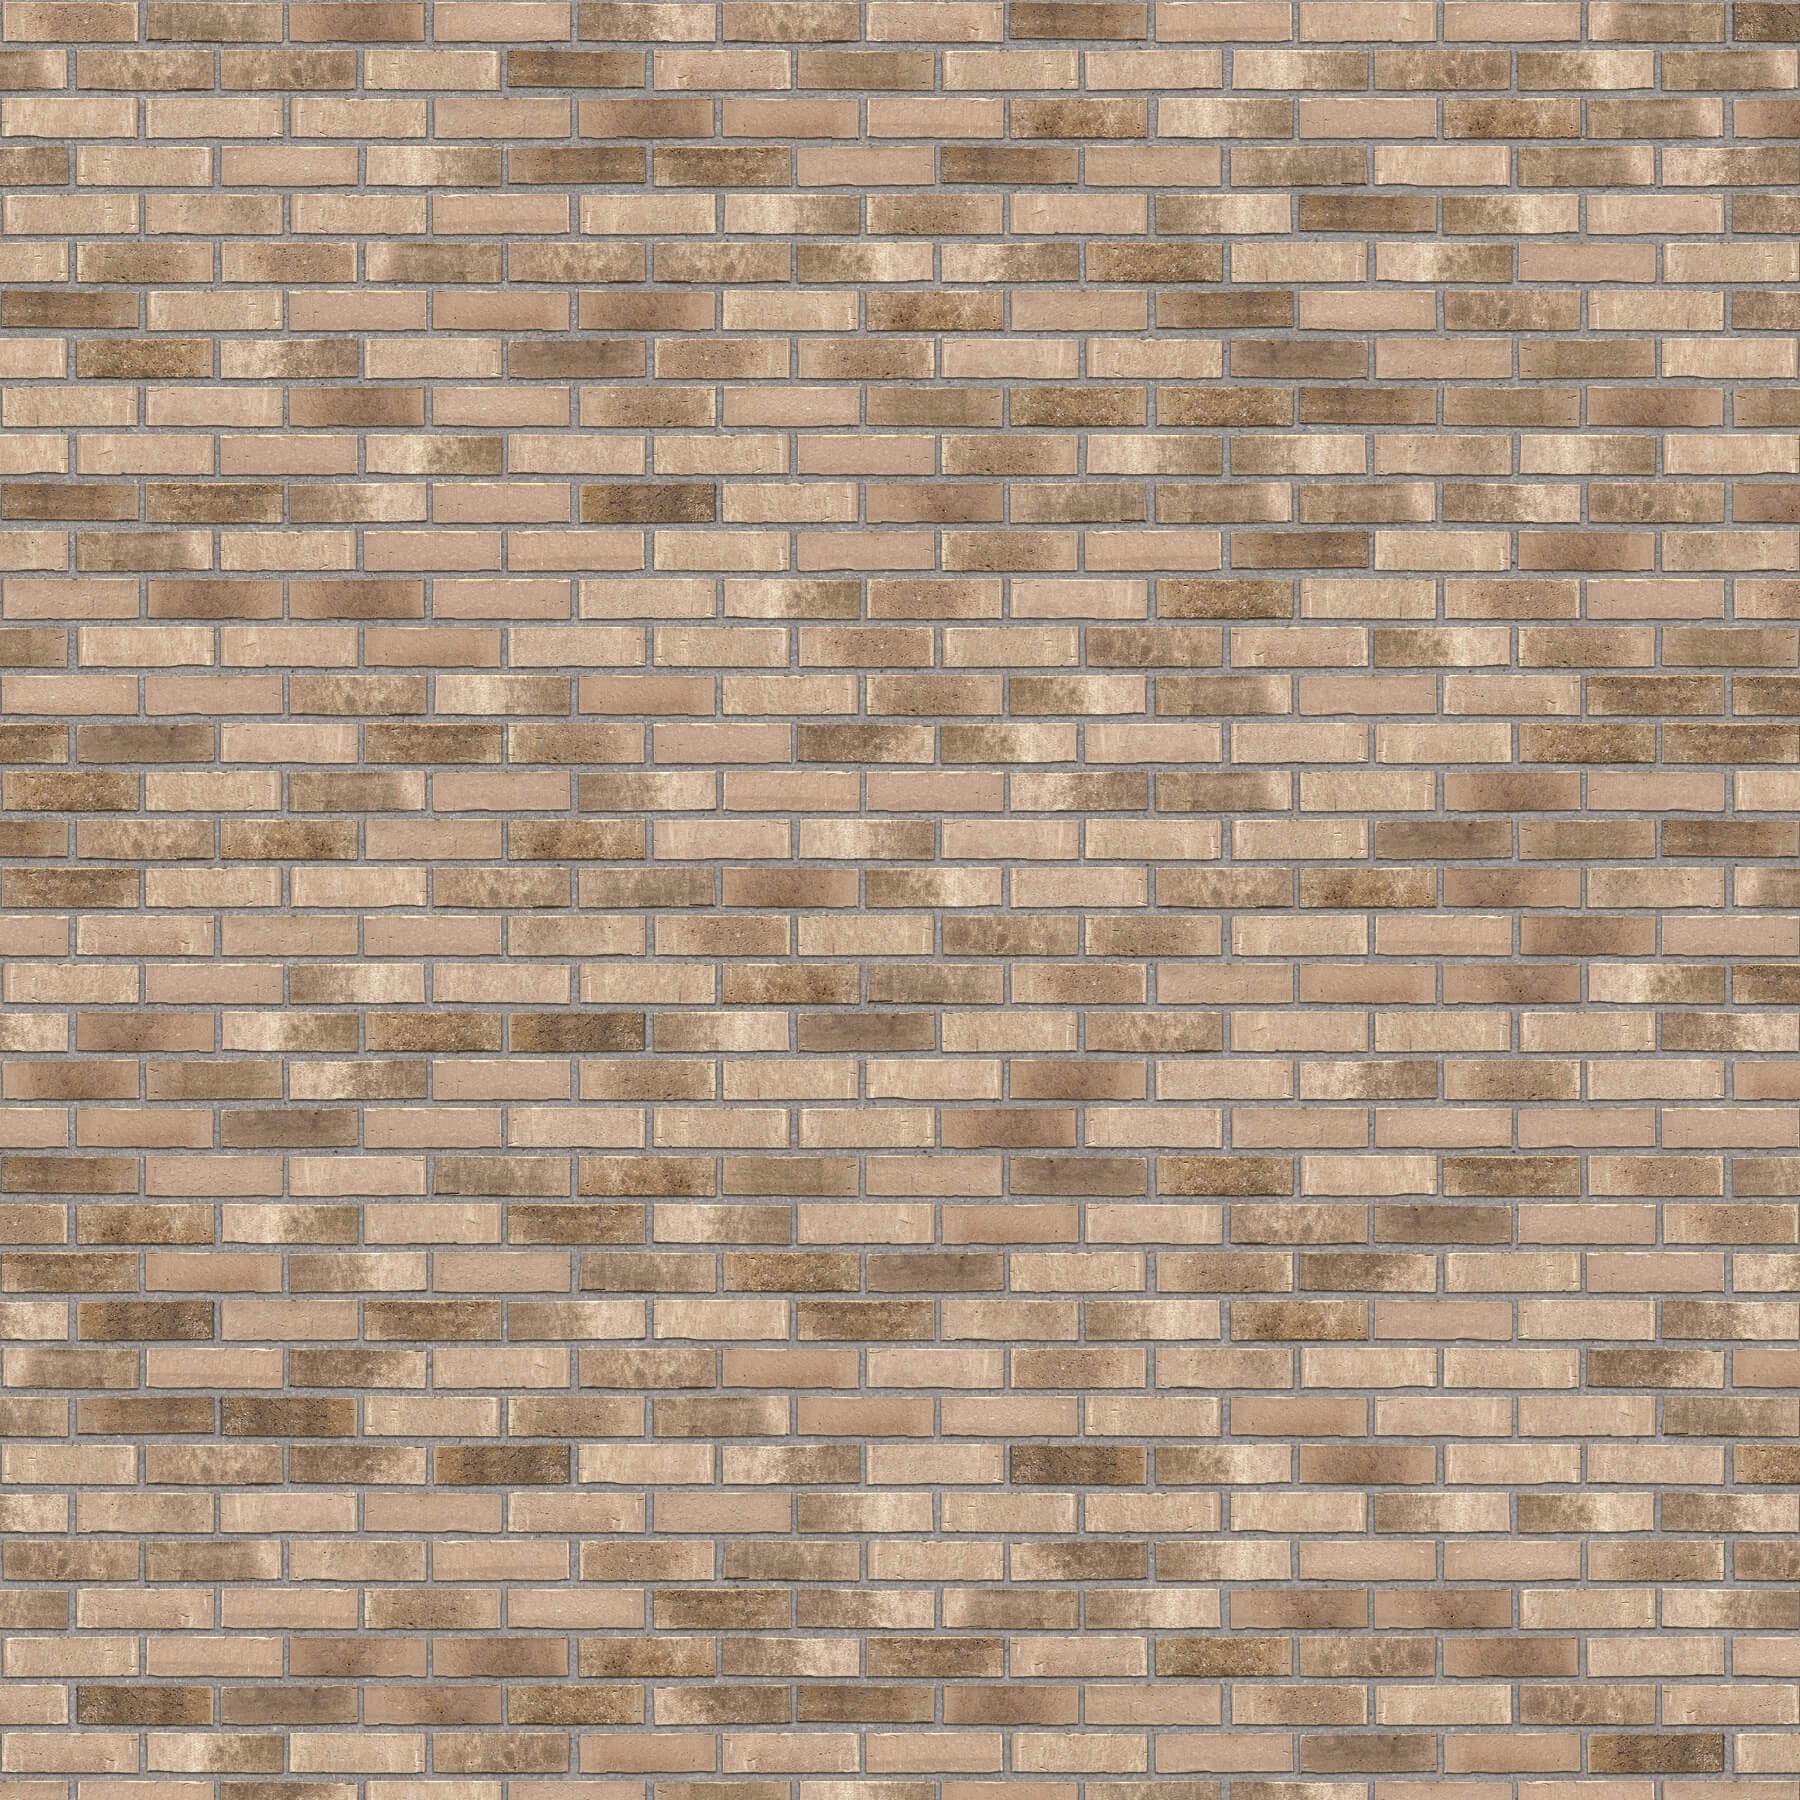 Puna-cigla-FeldHaus-Klinker-brick-house-beograd-nf-k-773-Siva Fuga